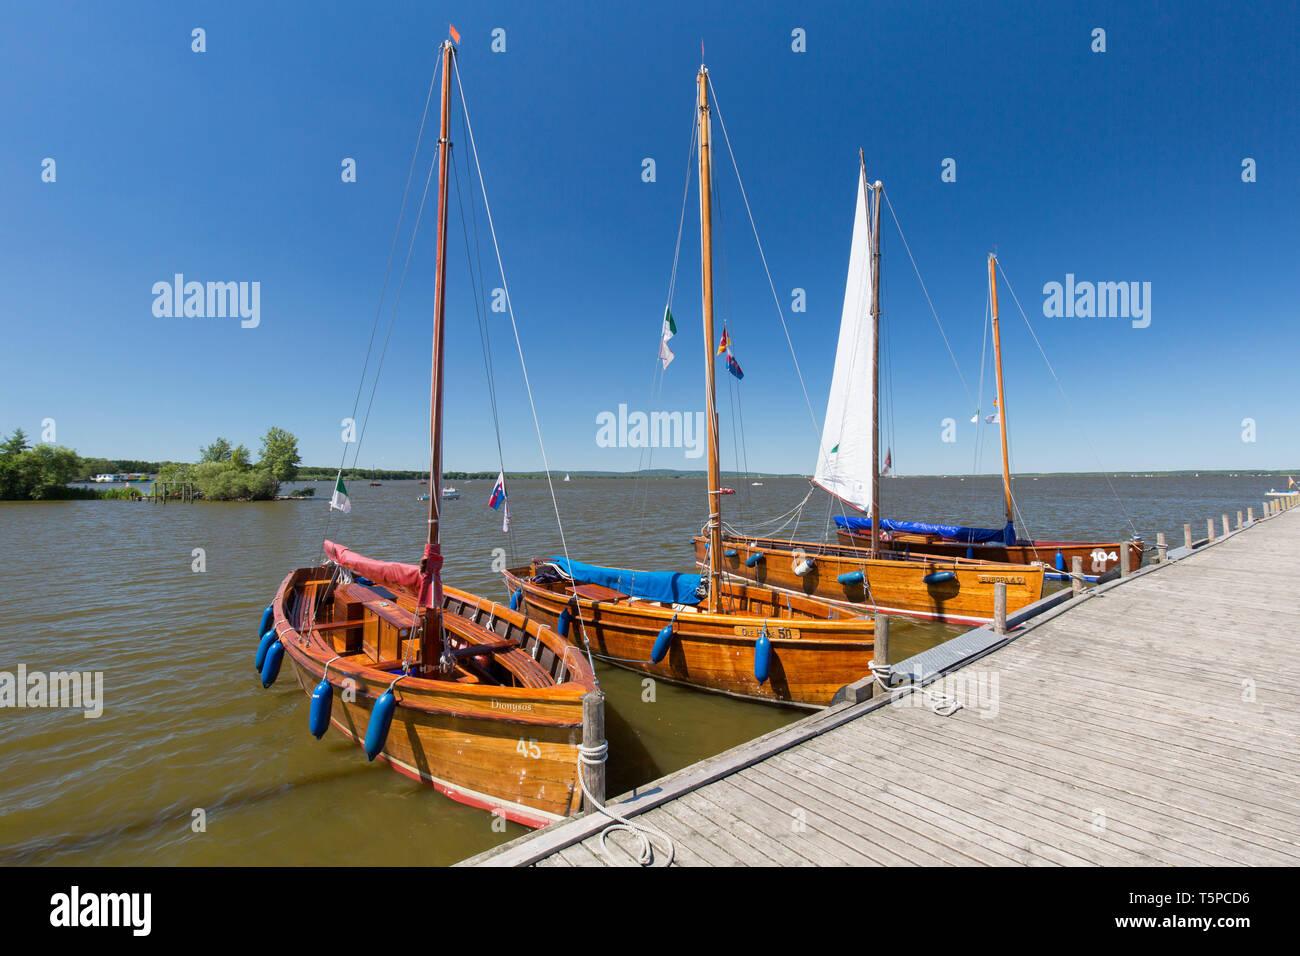 Old Wooden Sailing Boats Stock Photos Old Wooden Sailing Boats